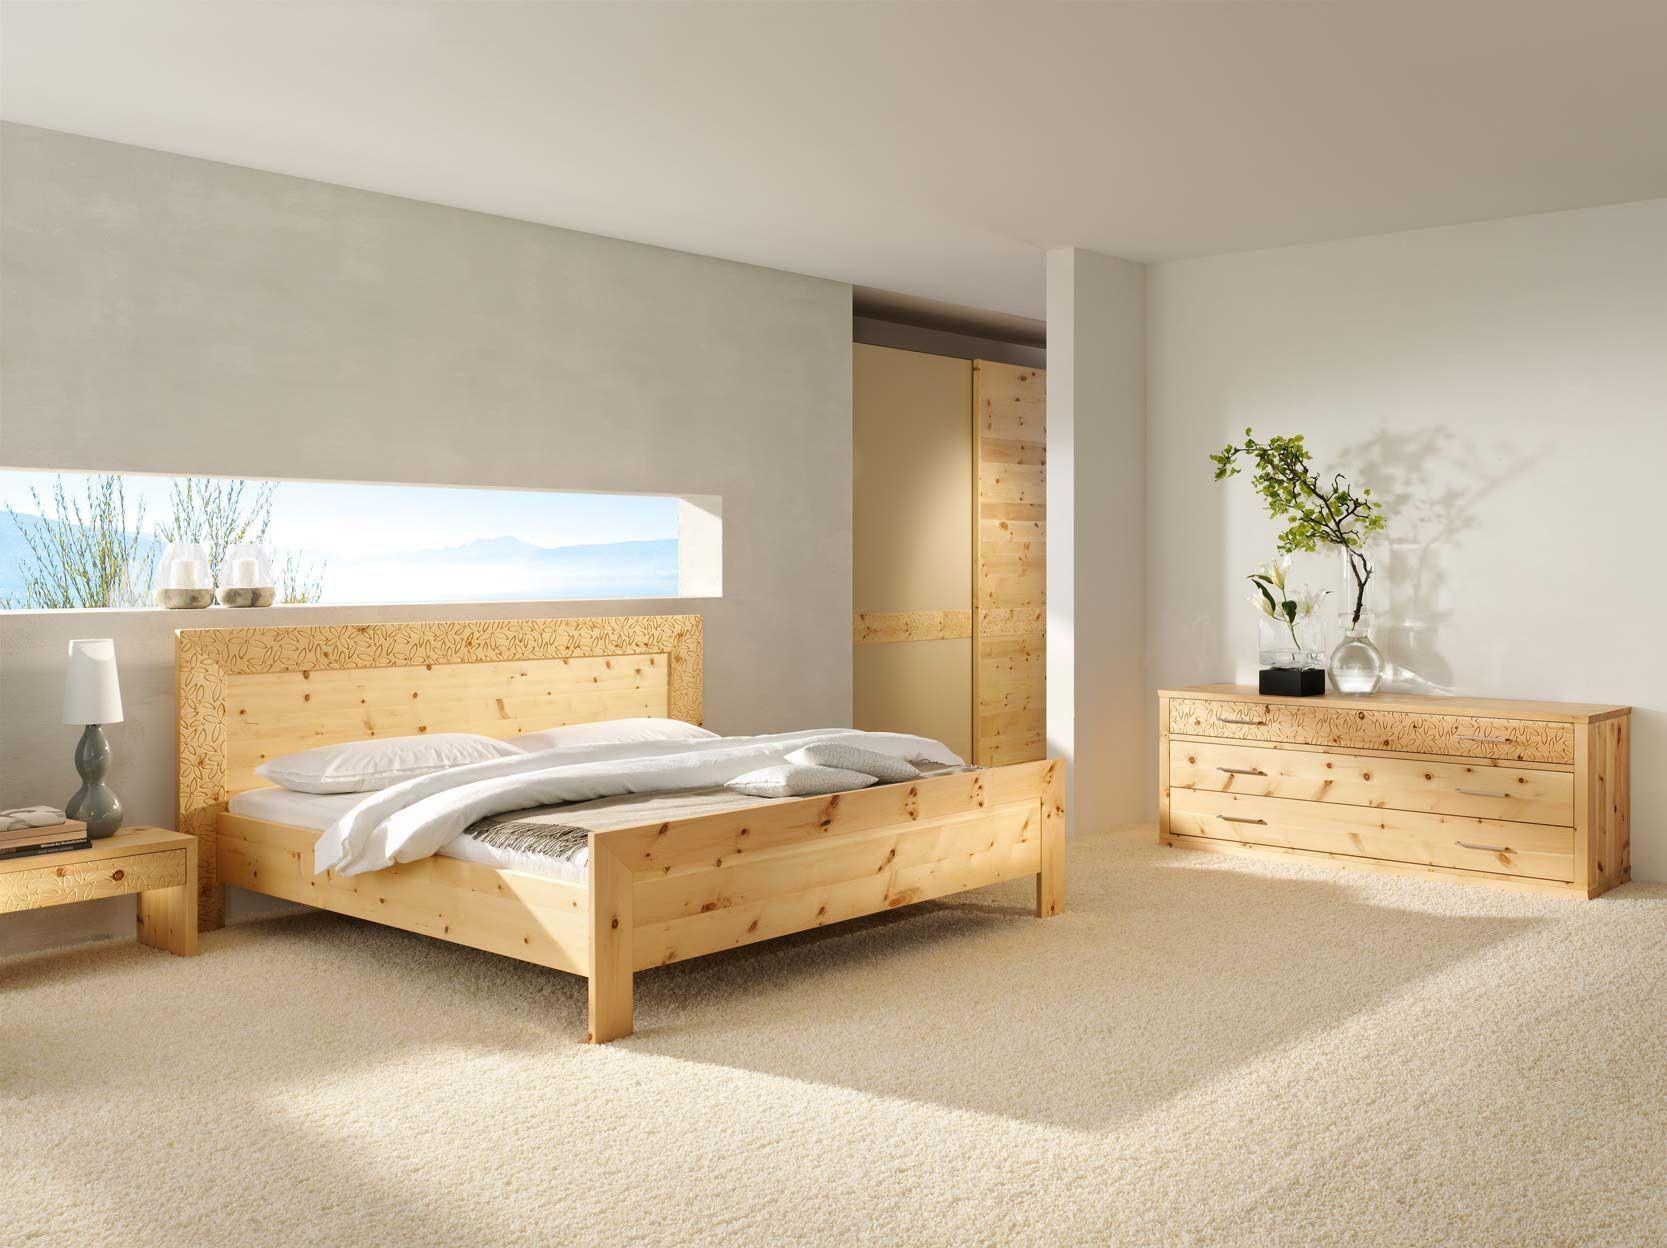 Handgefertigte Massivholz Mobel Zirbenholz Bett Schlafzimmer